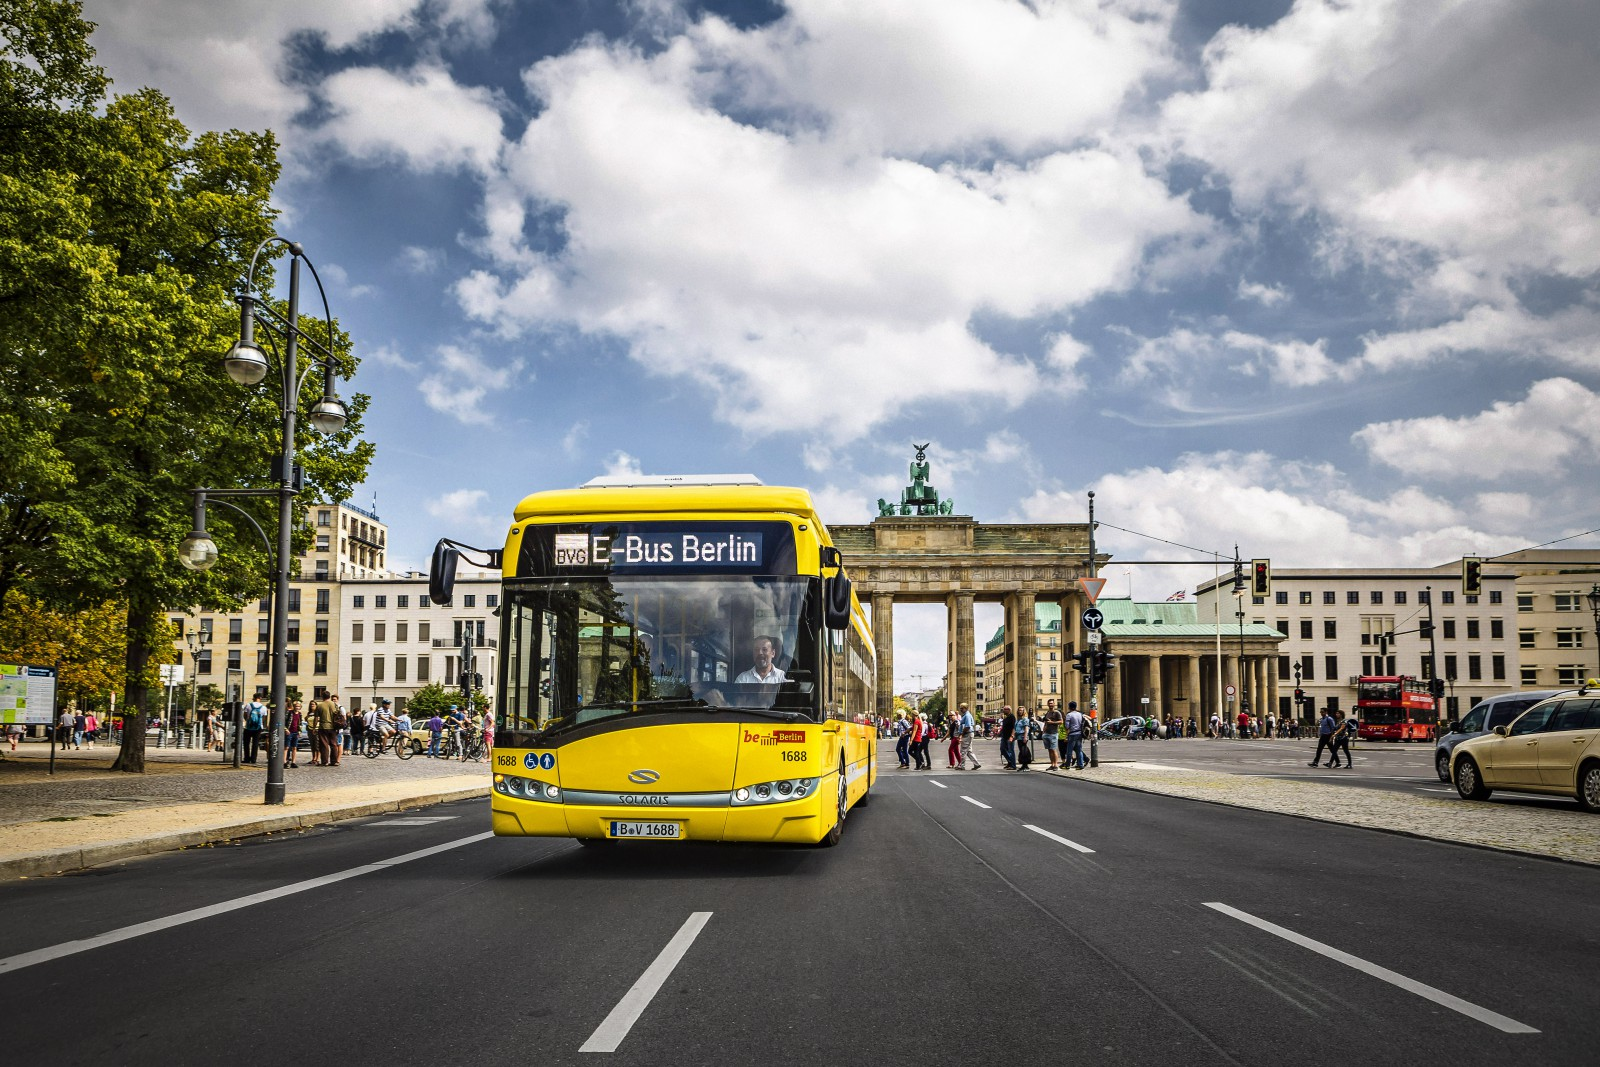 BT_PRIMOVE_e-bus_Berlin_BrandenburgerTor